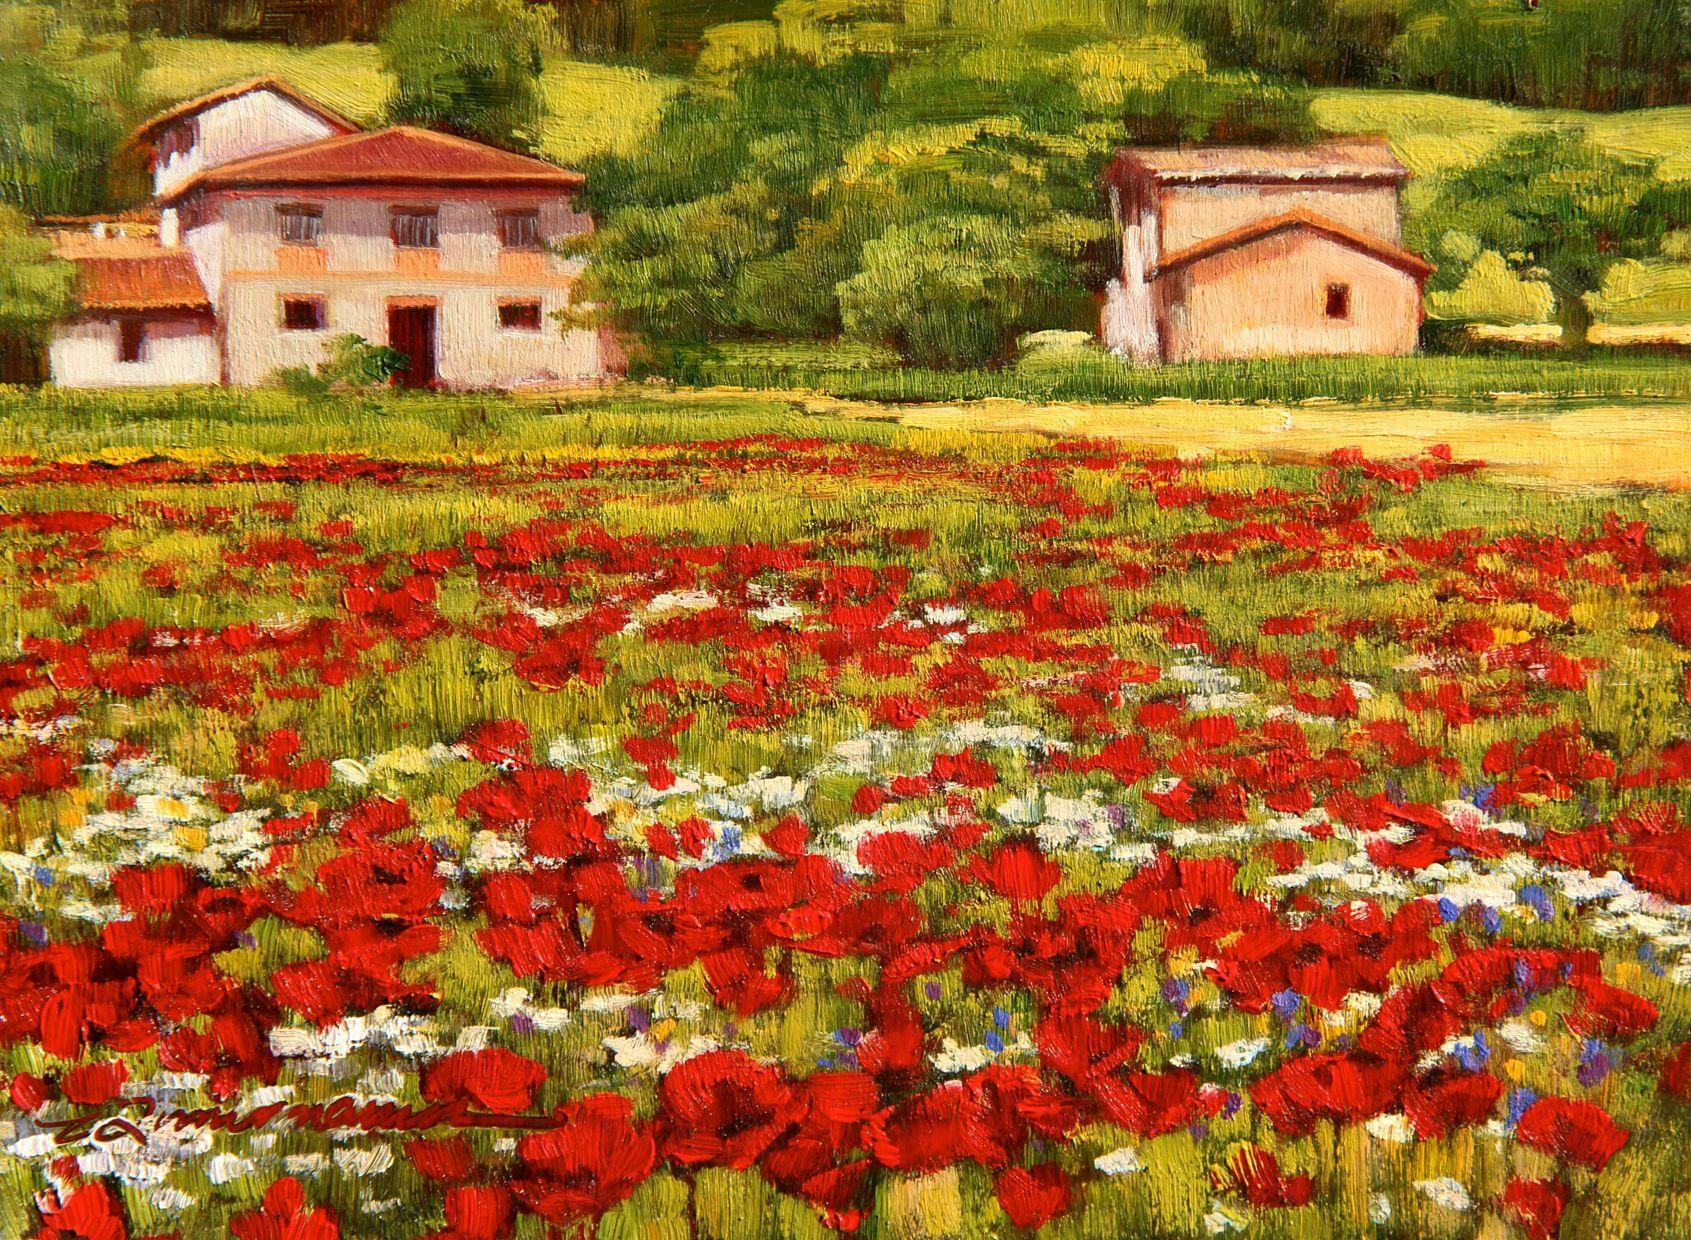 """Poppies in Spring""  oil painting by Caroline Zimmermann"